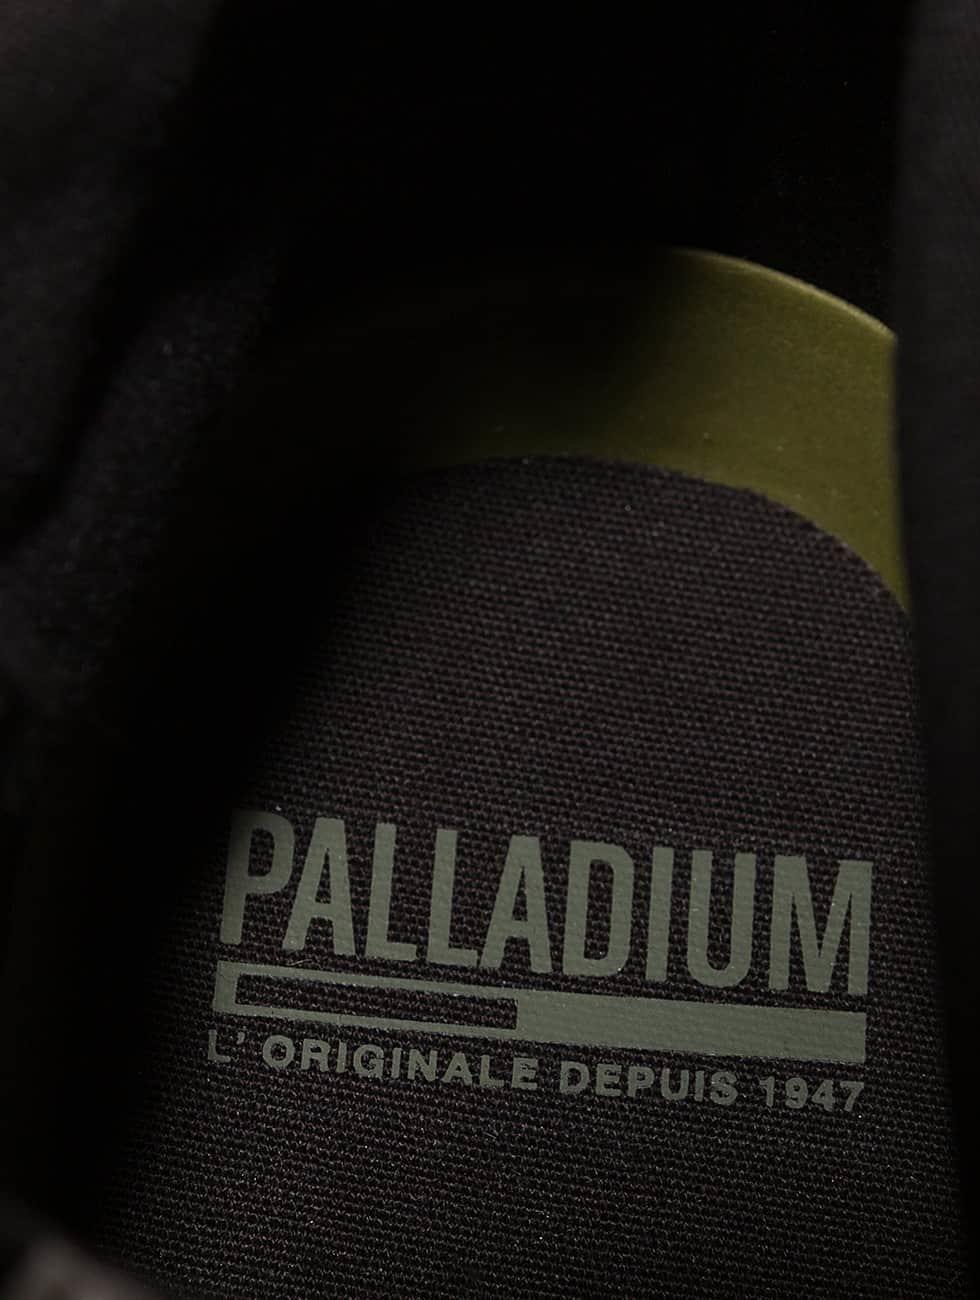 Palladium Sko / Støvler Pampa Hi Originale Tc Svart 411 603 Rekkefølge Outlet Rabatter Utløp Kostnaden Gratis Frakt Beste Med Kredittkort Billig Pris k8F8Fjop